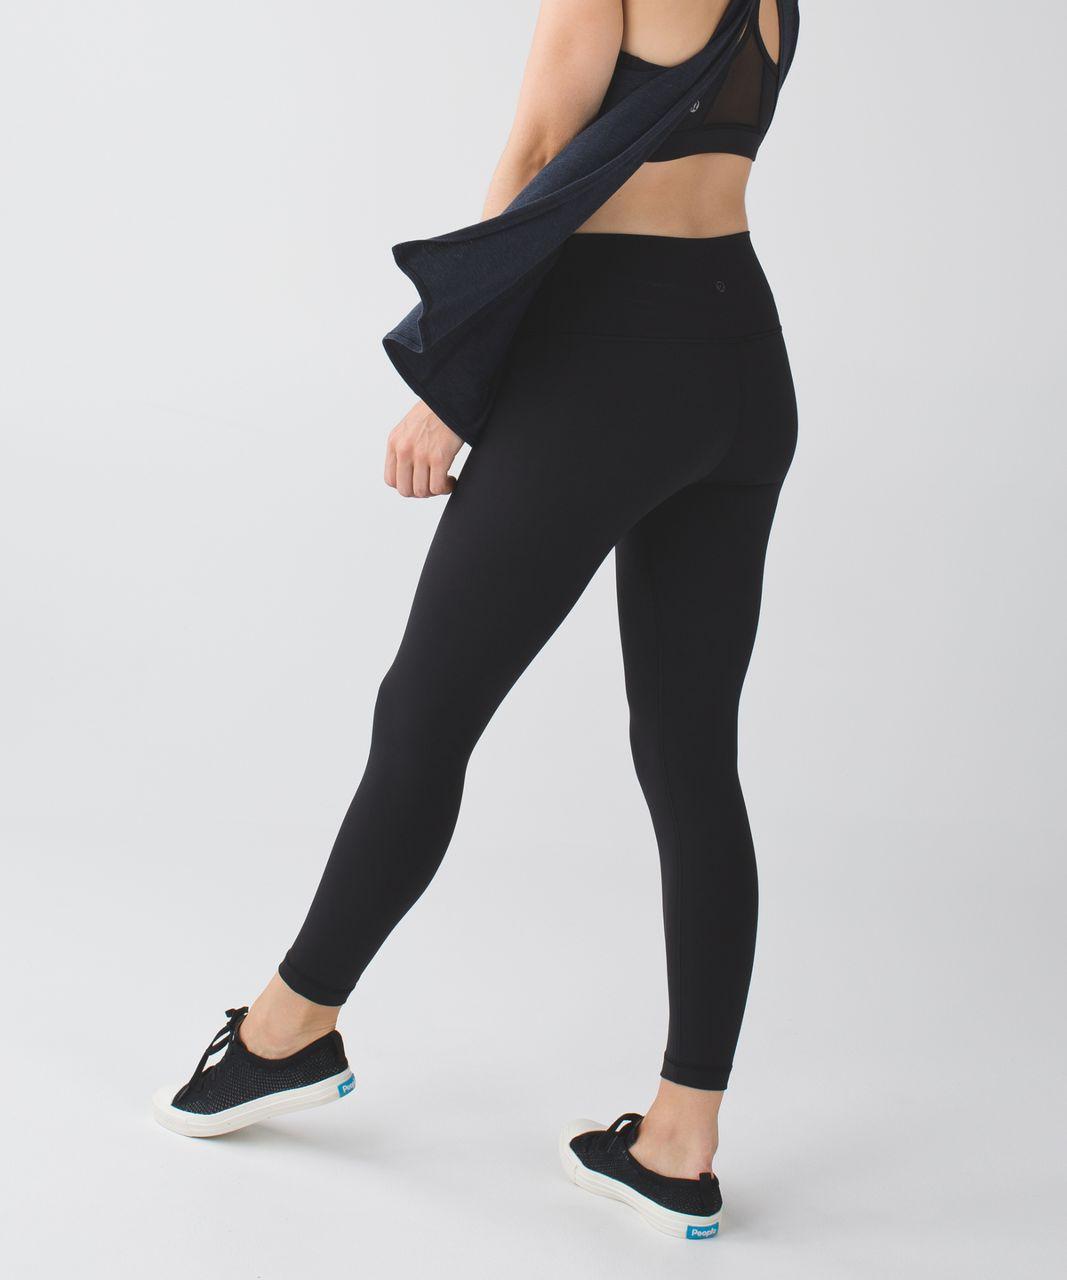 Lululemon High Times Pant *Full-On Luxtreme - Black